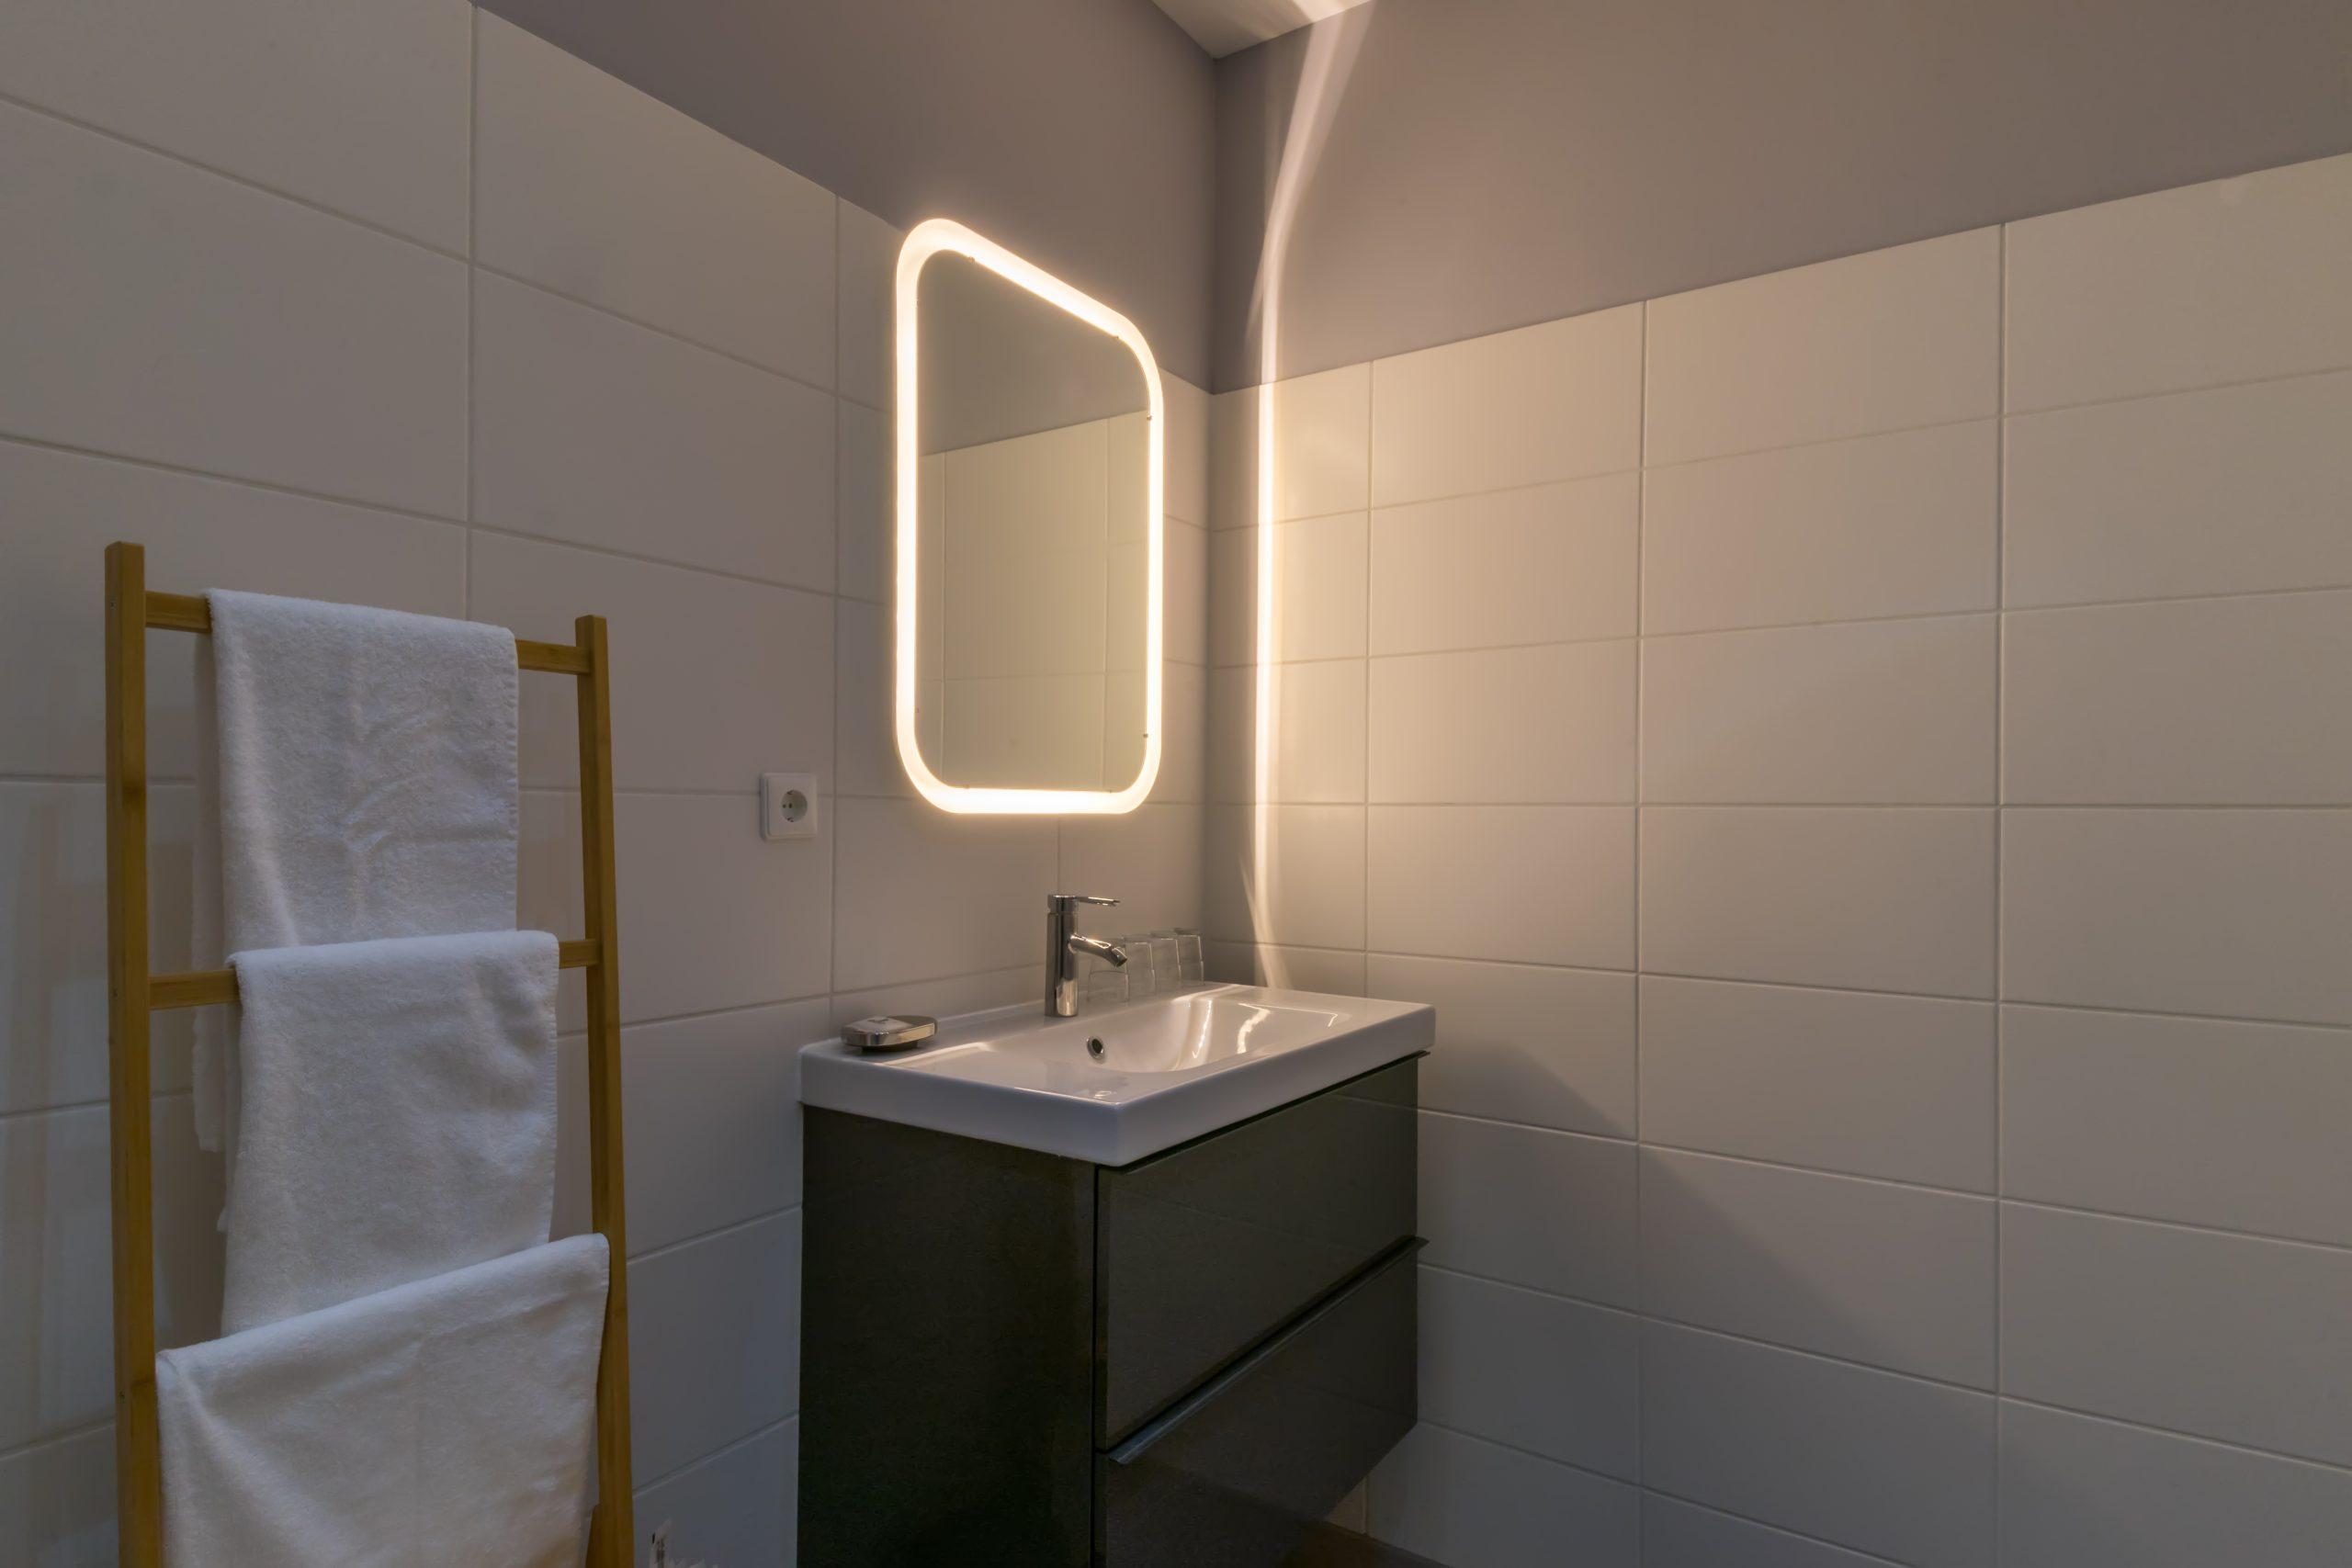 Badkamer-Bathroom-bathzimmer-Jacob-van-Ruisdael-Relaxed-Slapen-2